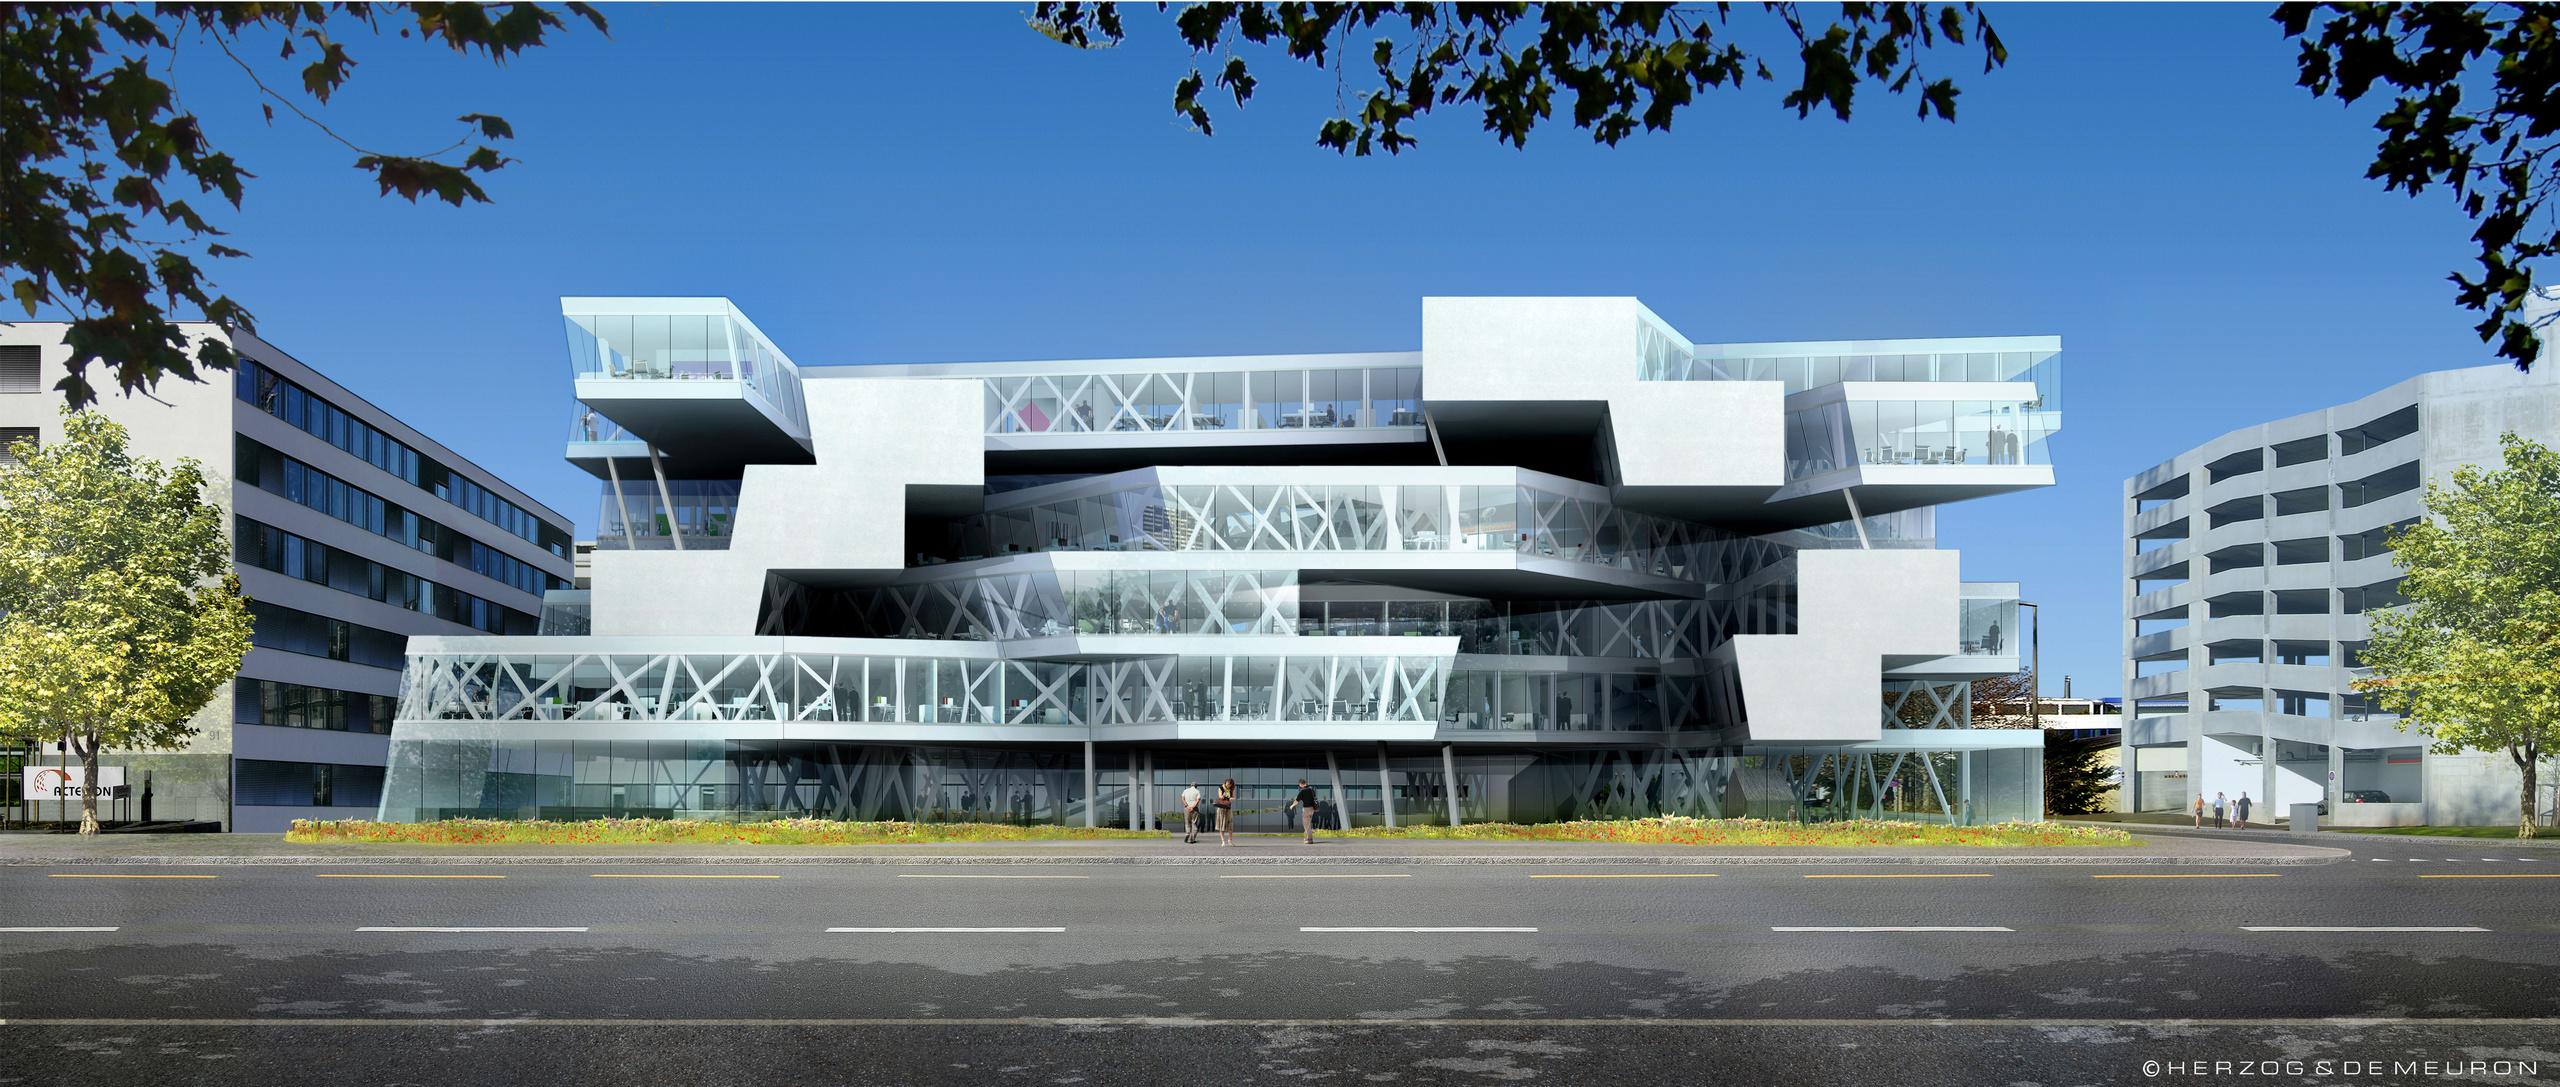 Entrevista jacques herzog docentes libres de mar del plata for Edificios educativos arquitectura